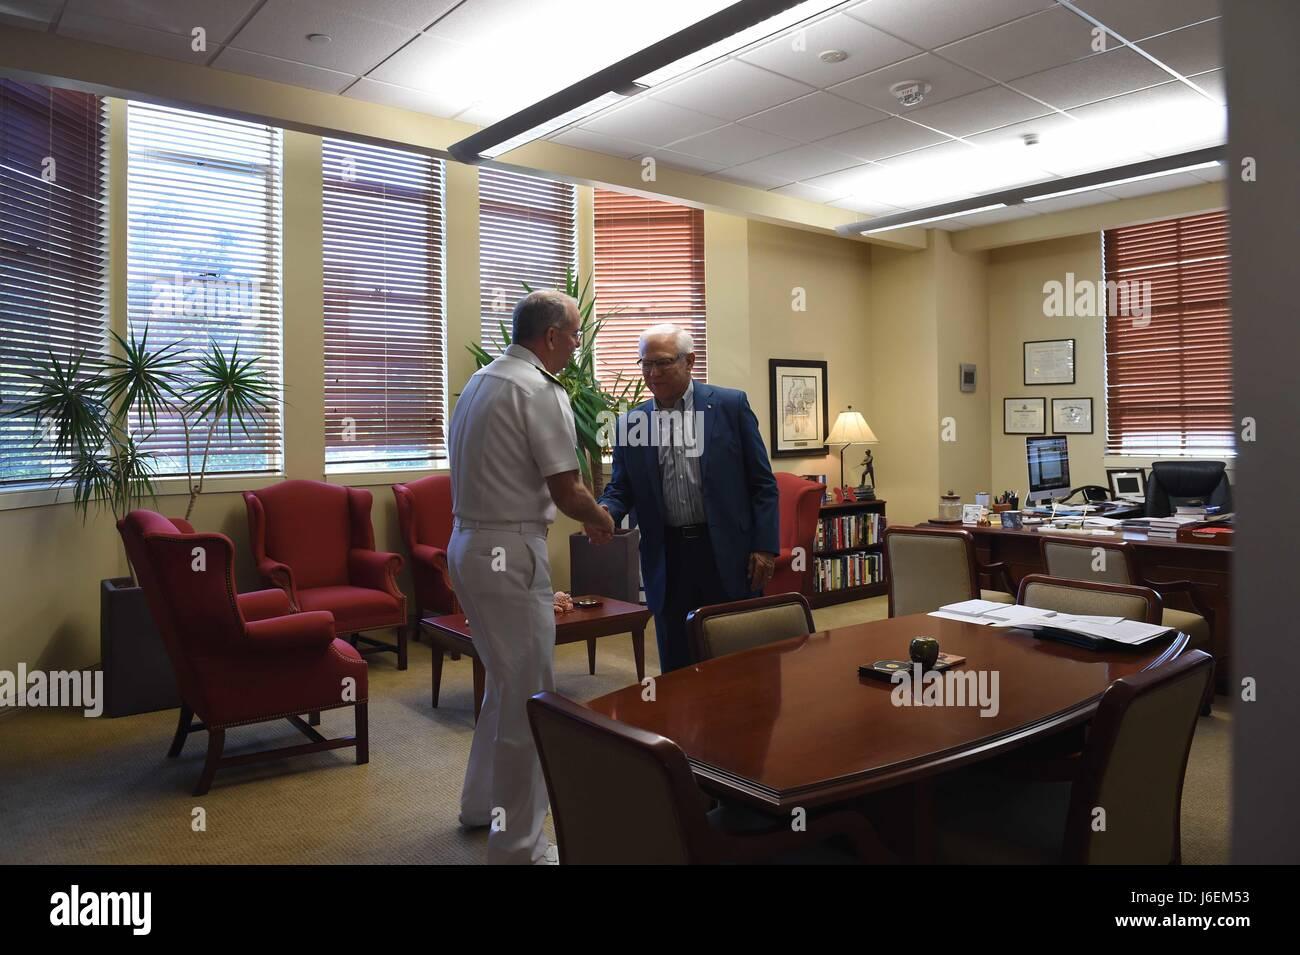 BOISE Idaho August 24 2016 Bob Kustra President Of Boise State